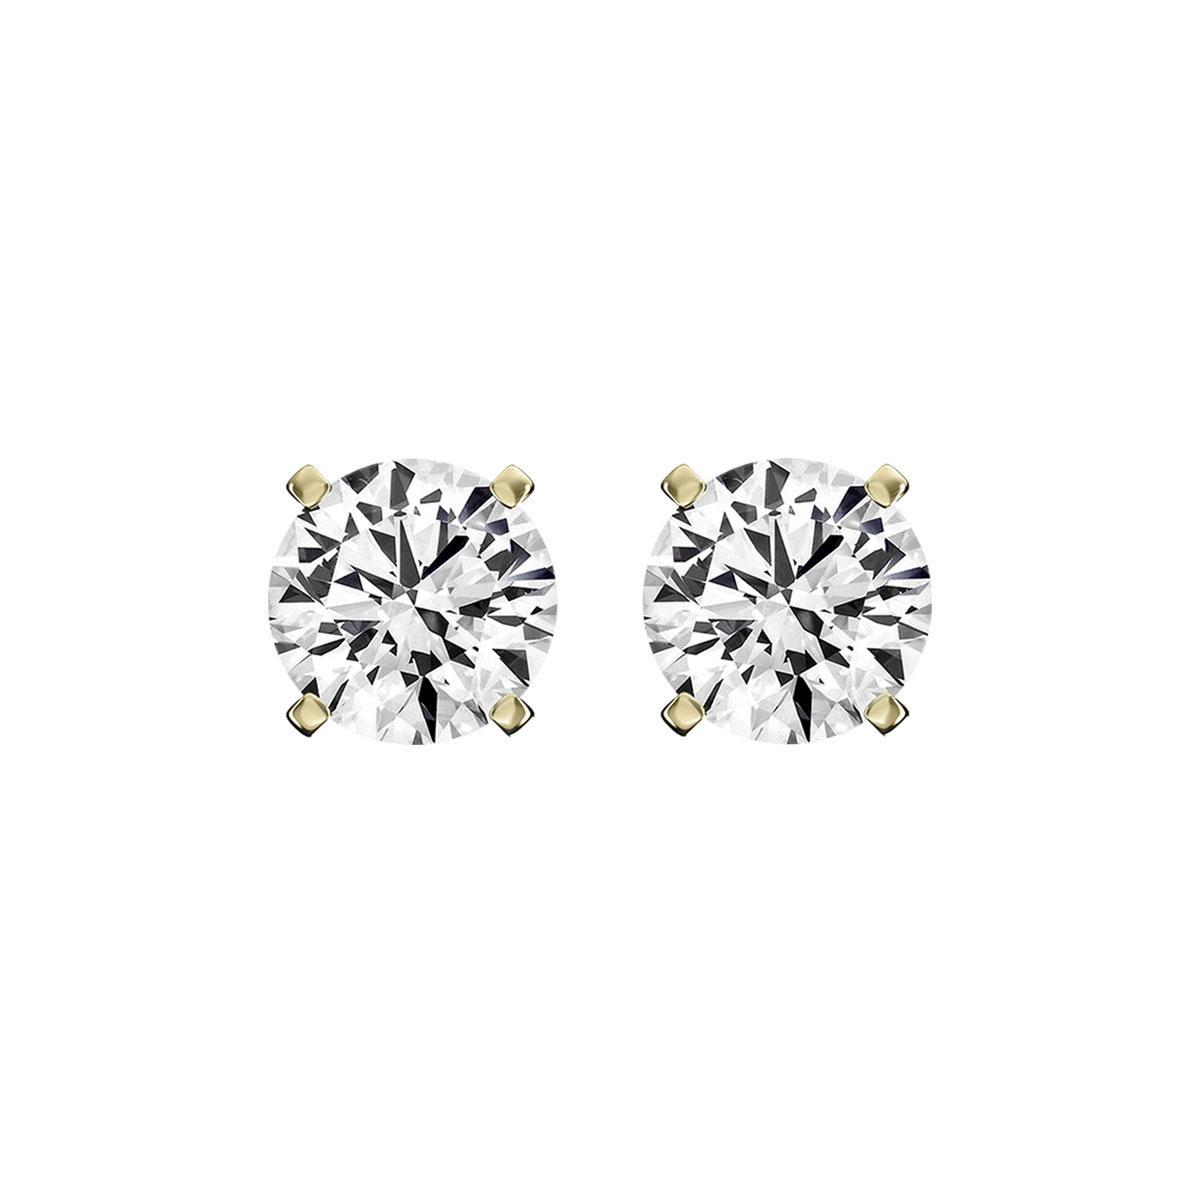 14K Yellow Gold Diamond Stud Earrings ( 1/4 ct. tw)